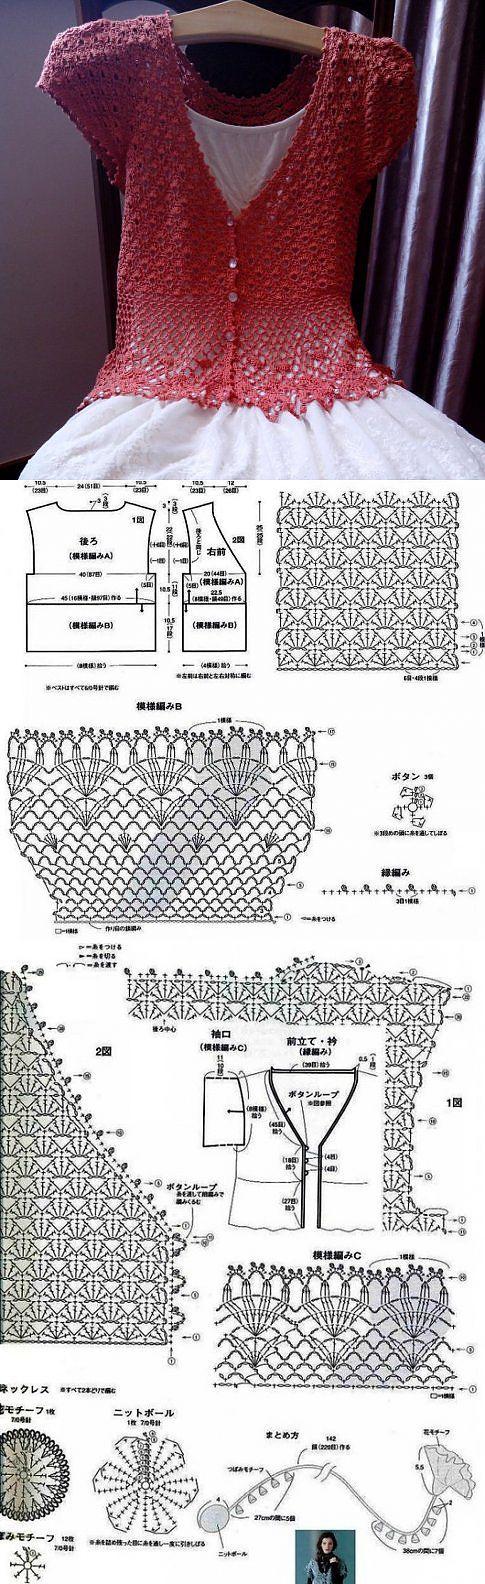 crochet lace summer cardigan - crafts ideas - crafts for kids | туники , кофточки | Постила